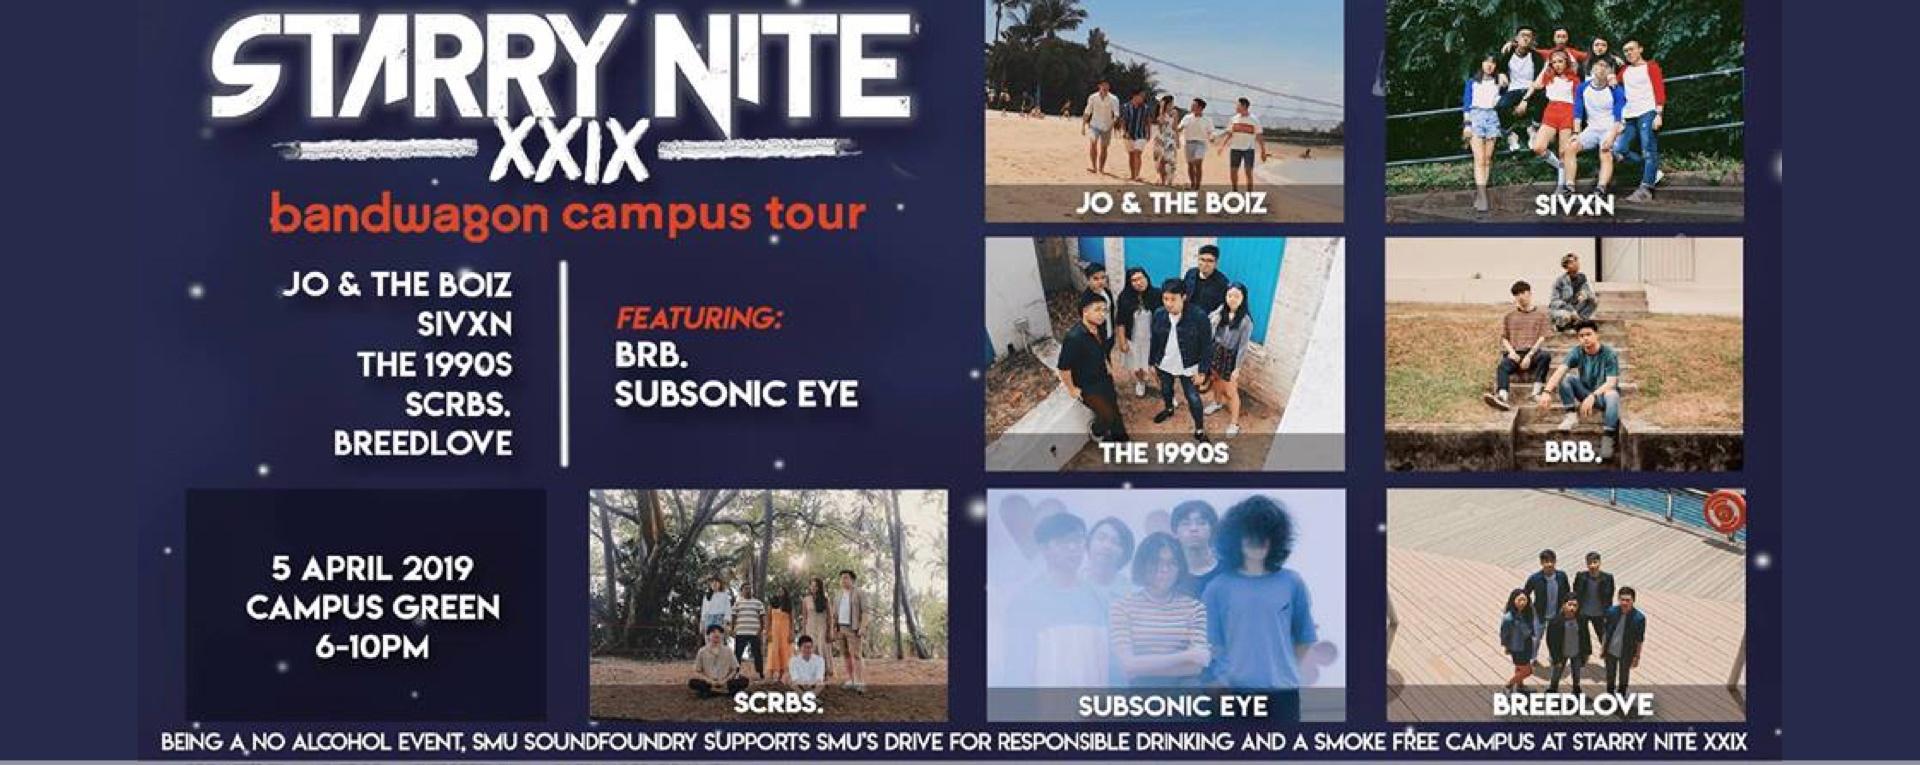 Starry Nite XXIX x Bandwagon Campus Tour